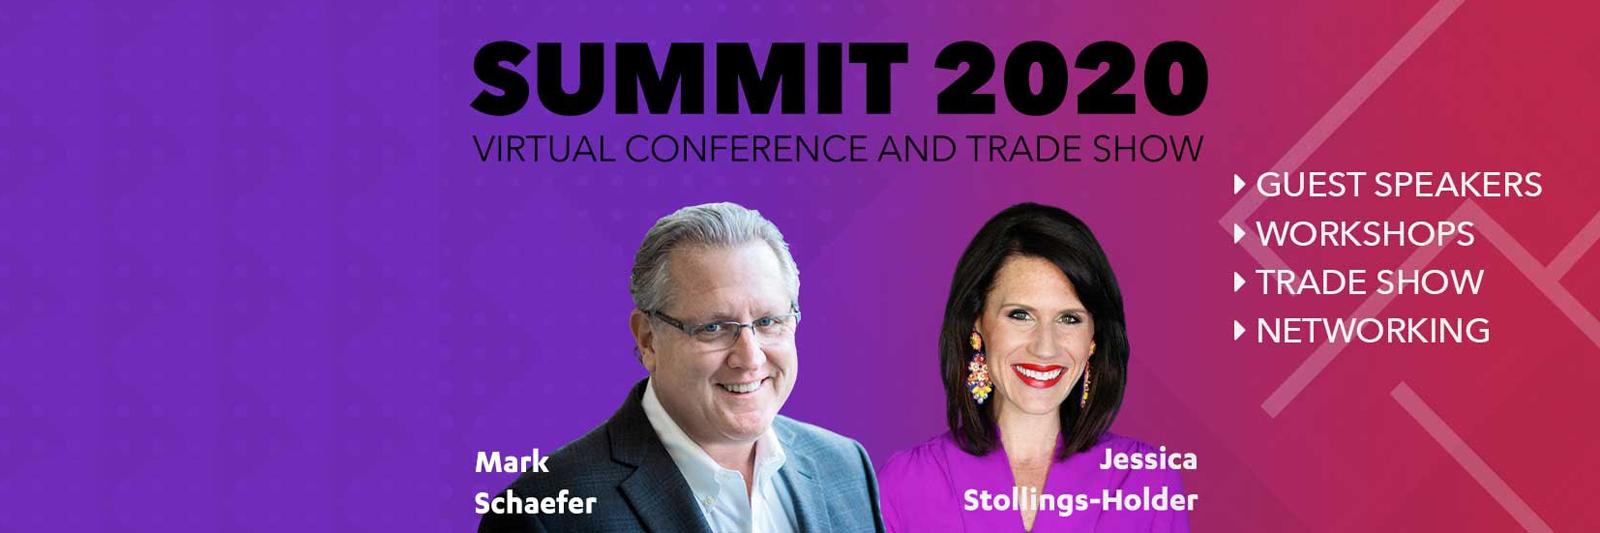 Summit-Web-Slideshow.png